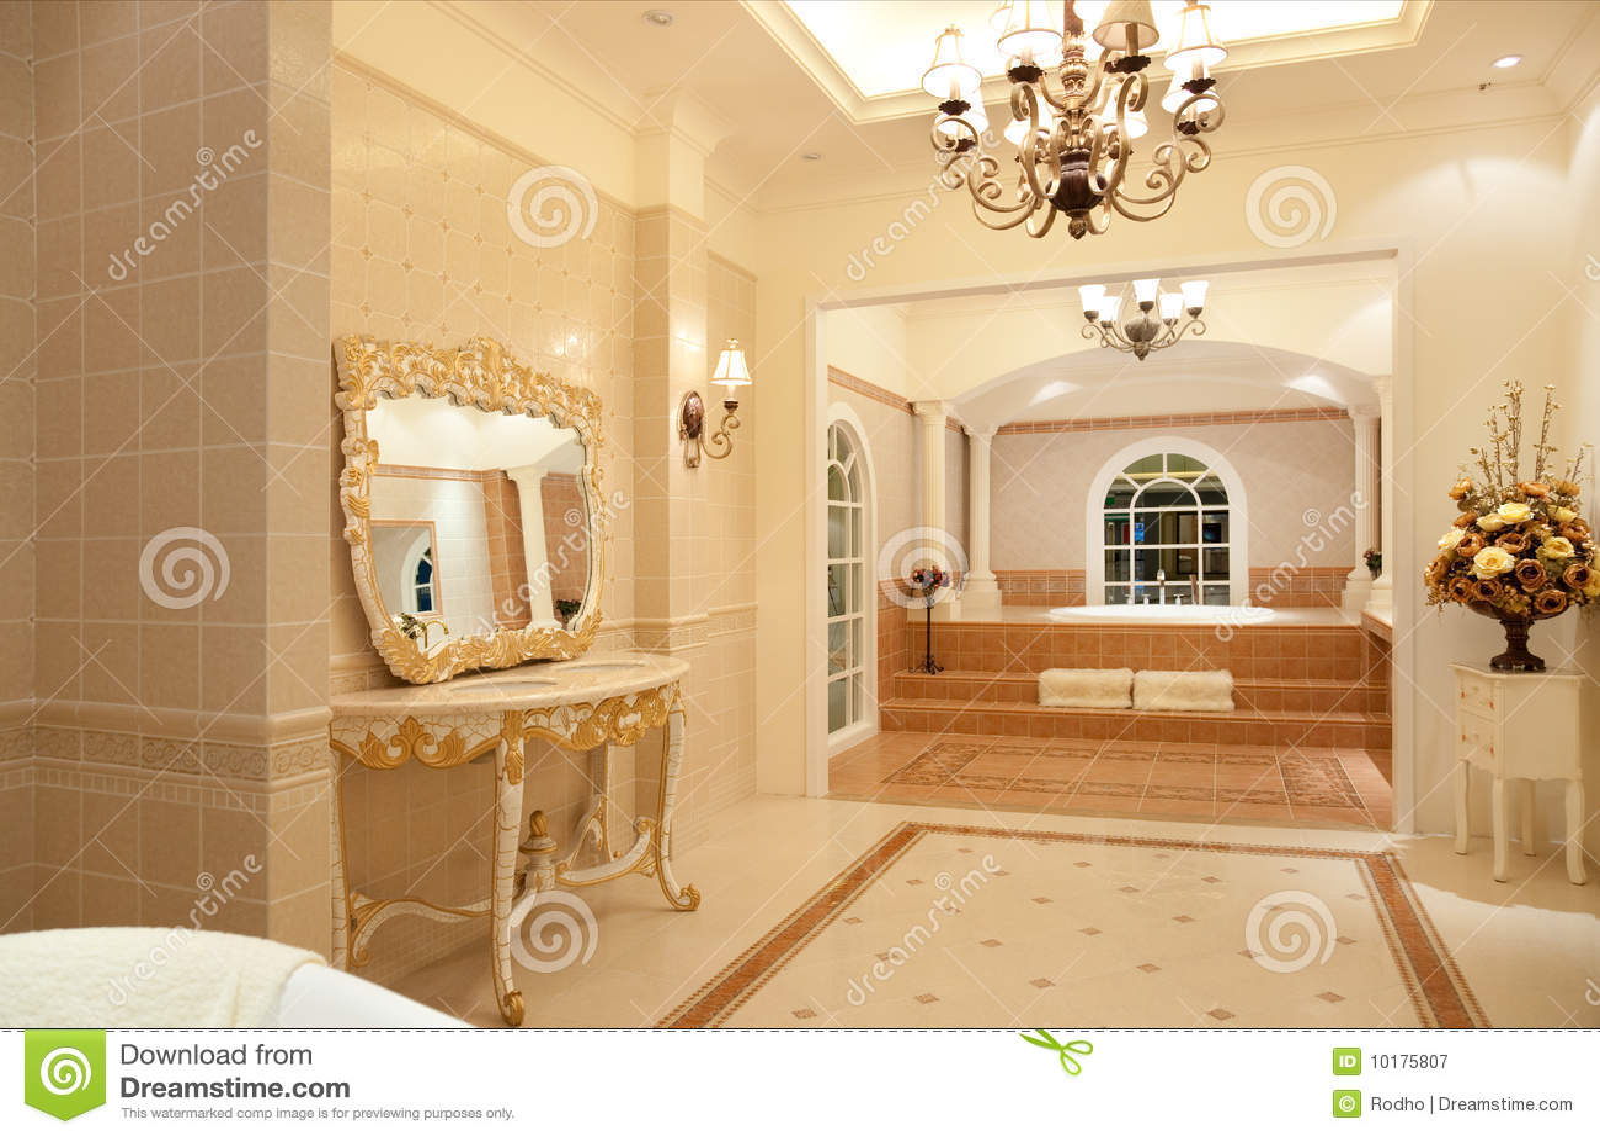 Luxury master bathroom stock image image of bathroom 10175807 - Image of bathroom ...